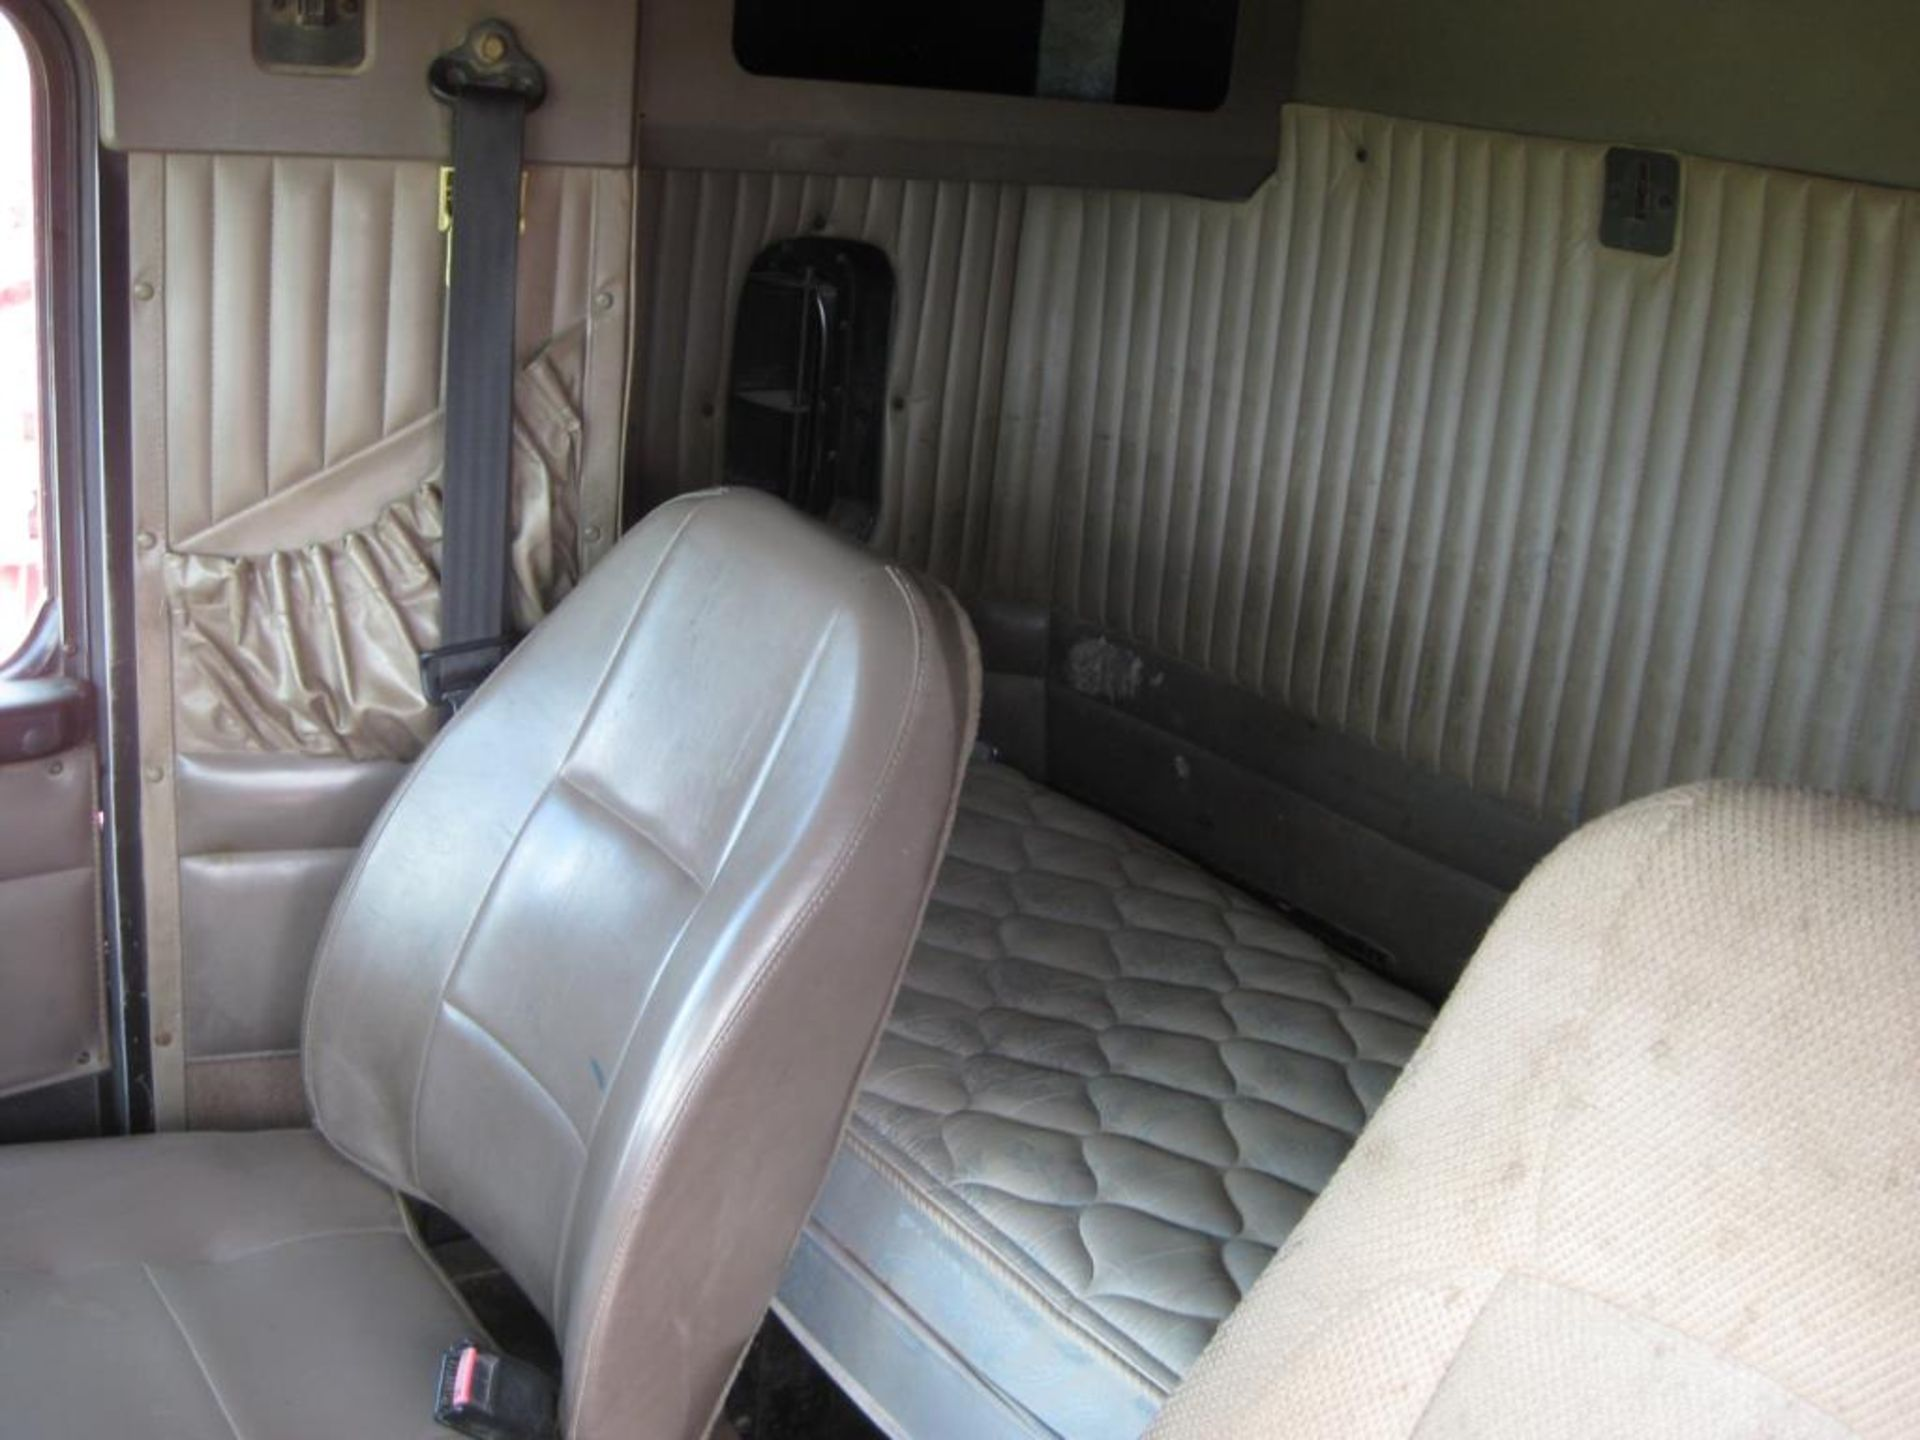 Kenworth Truck - Image 12 of 20